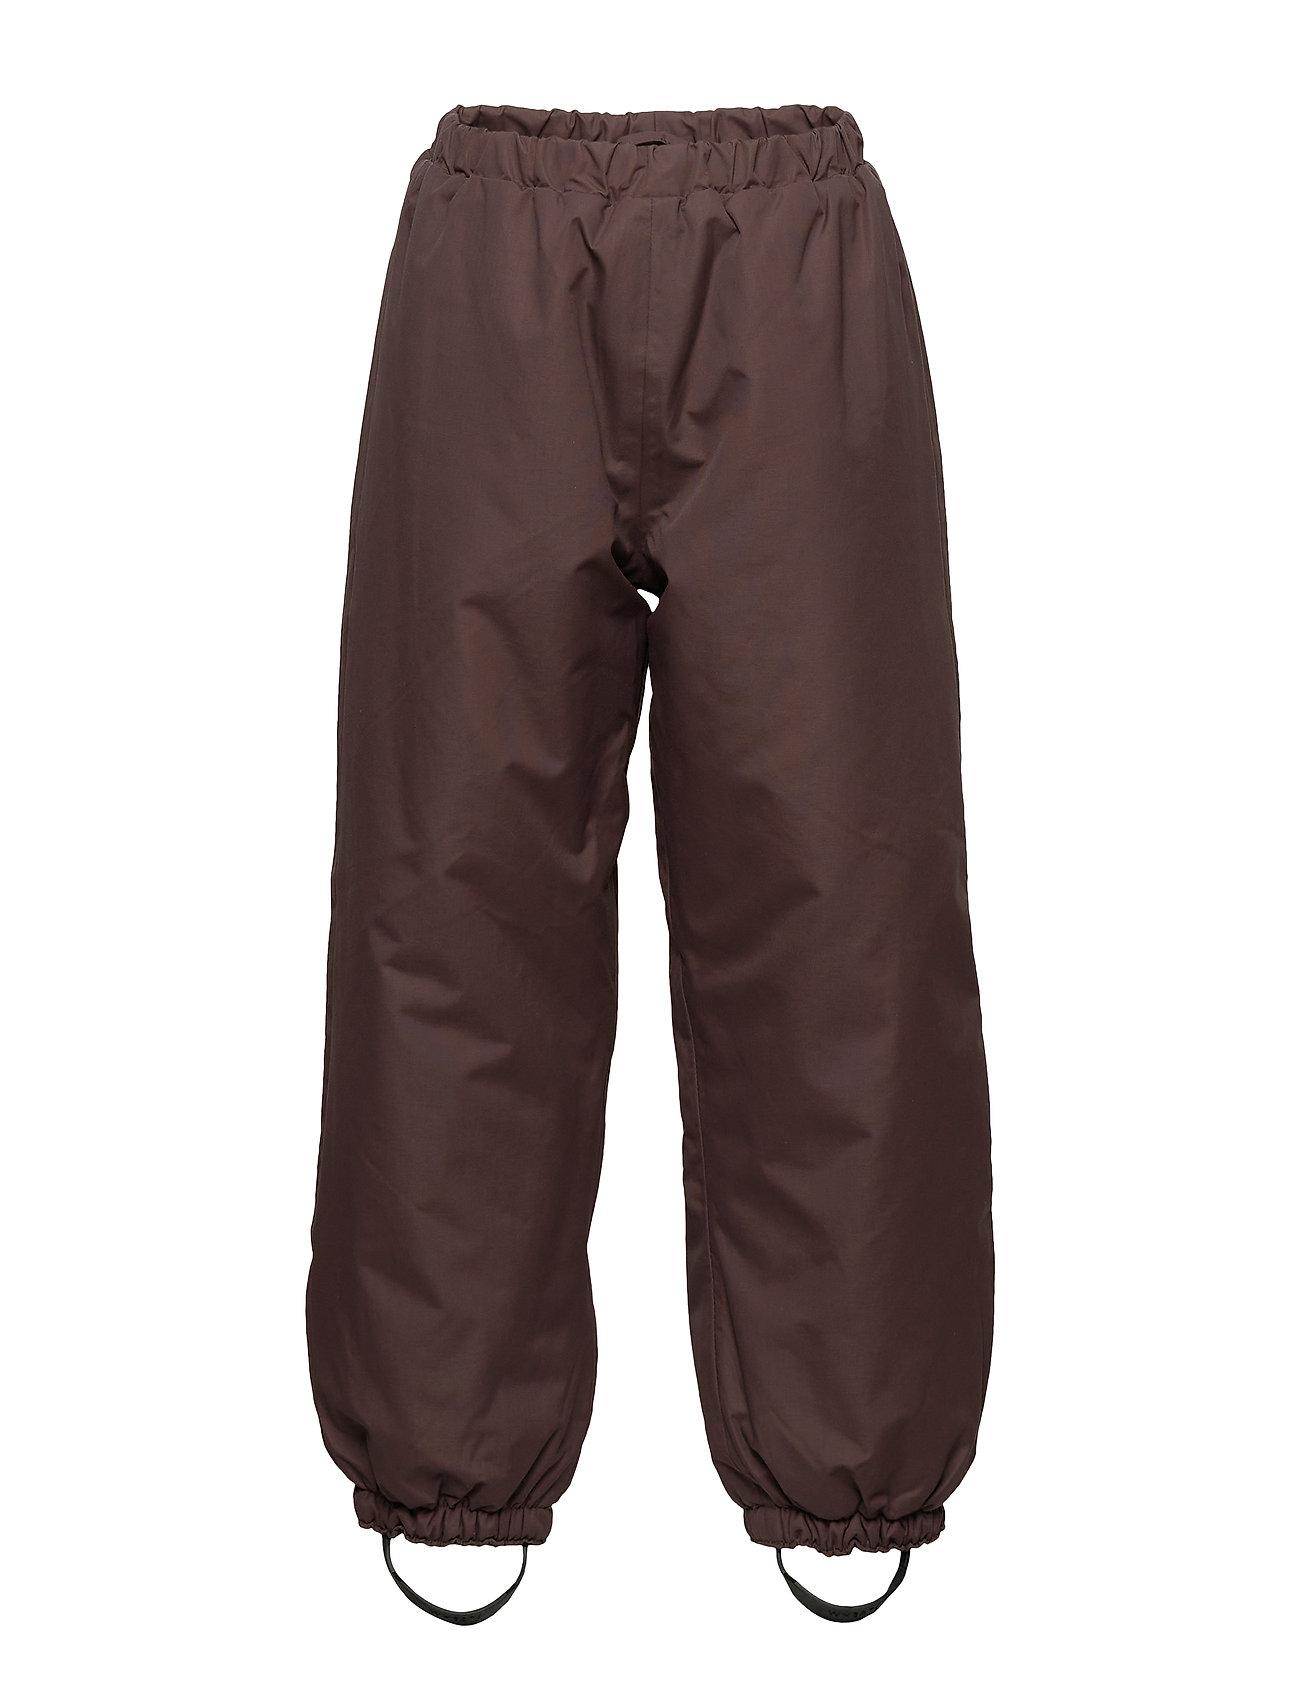 Wheat Ski Pants Jay - EGGPLANT